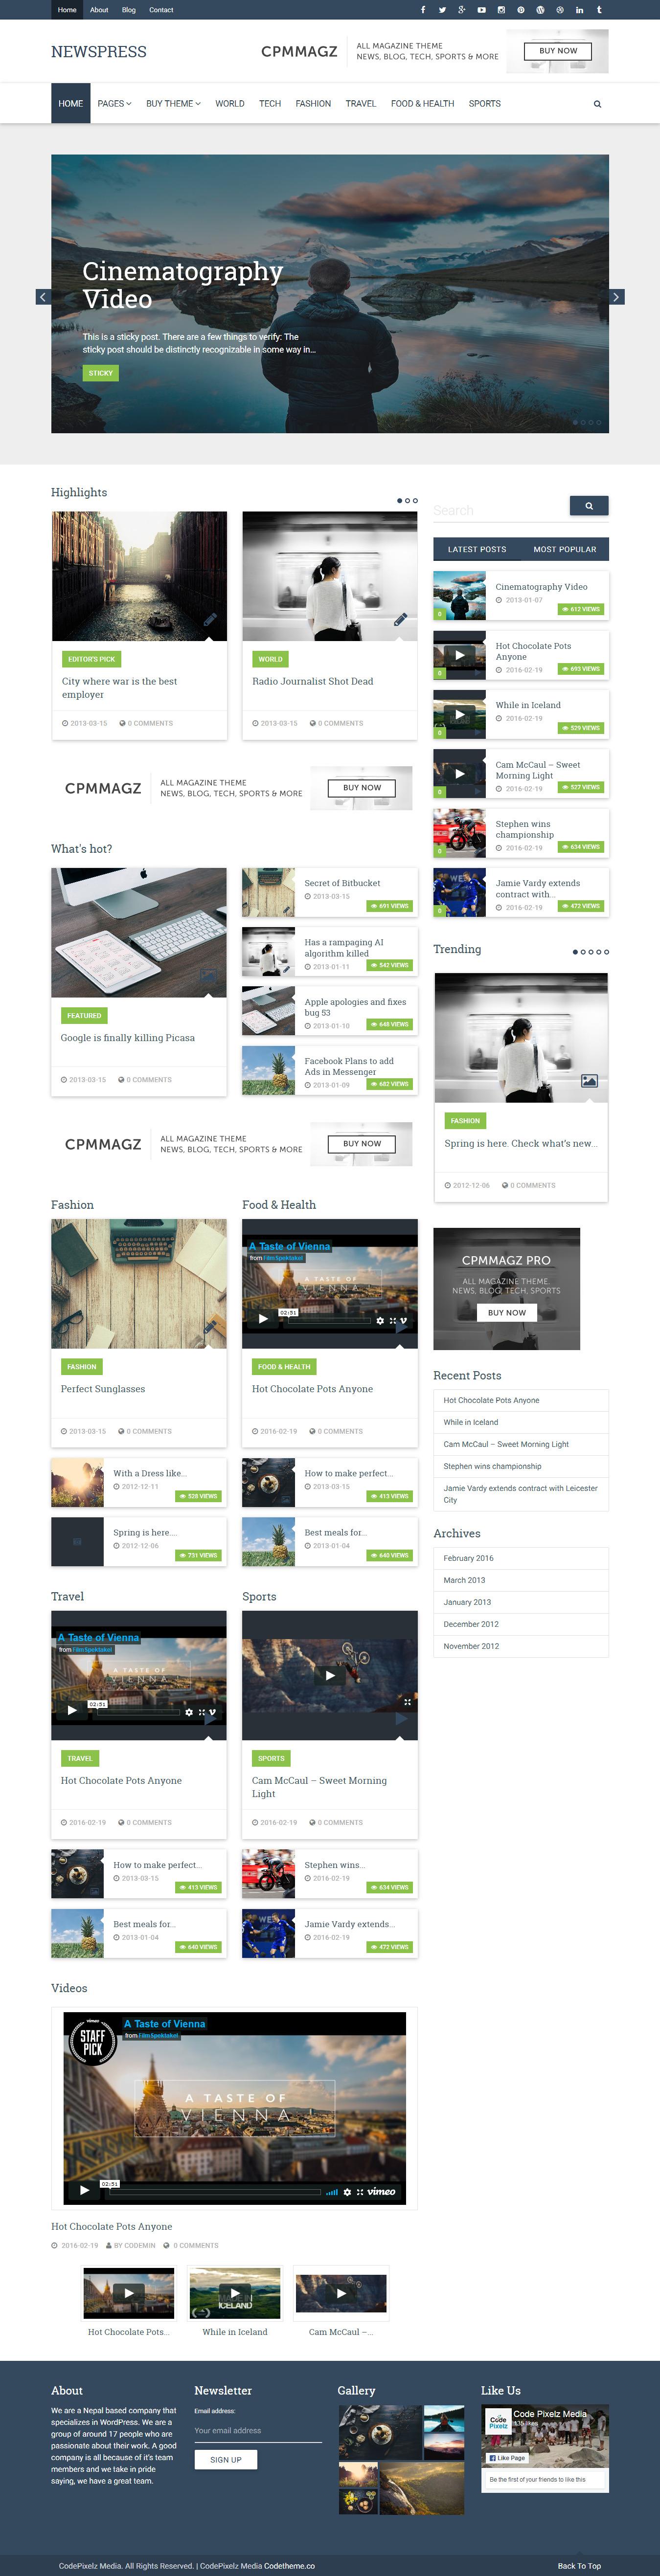 CPMmagz - Best Free Material Design WordPress Theme